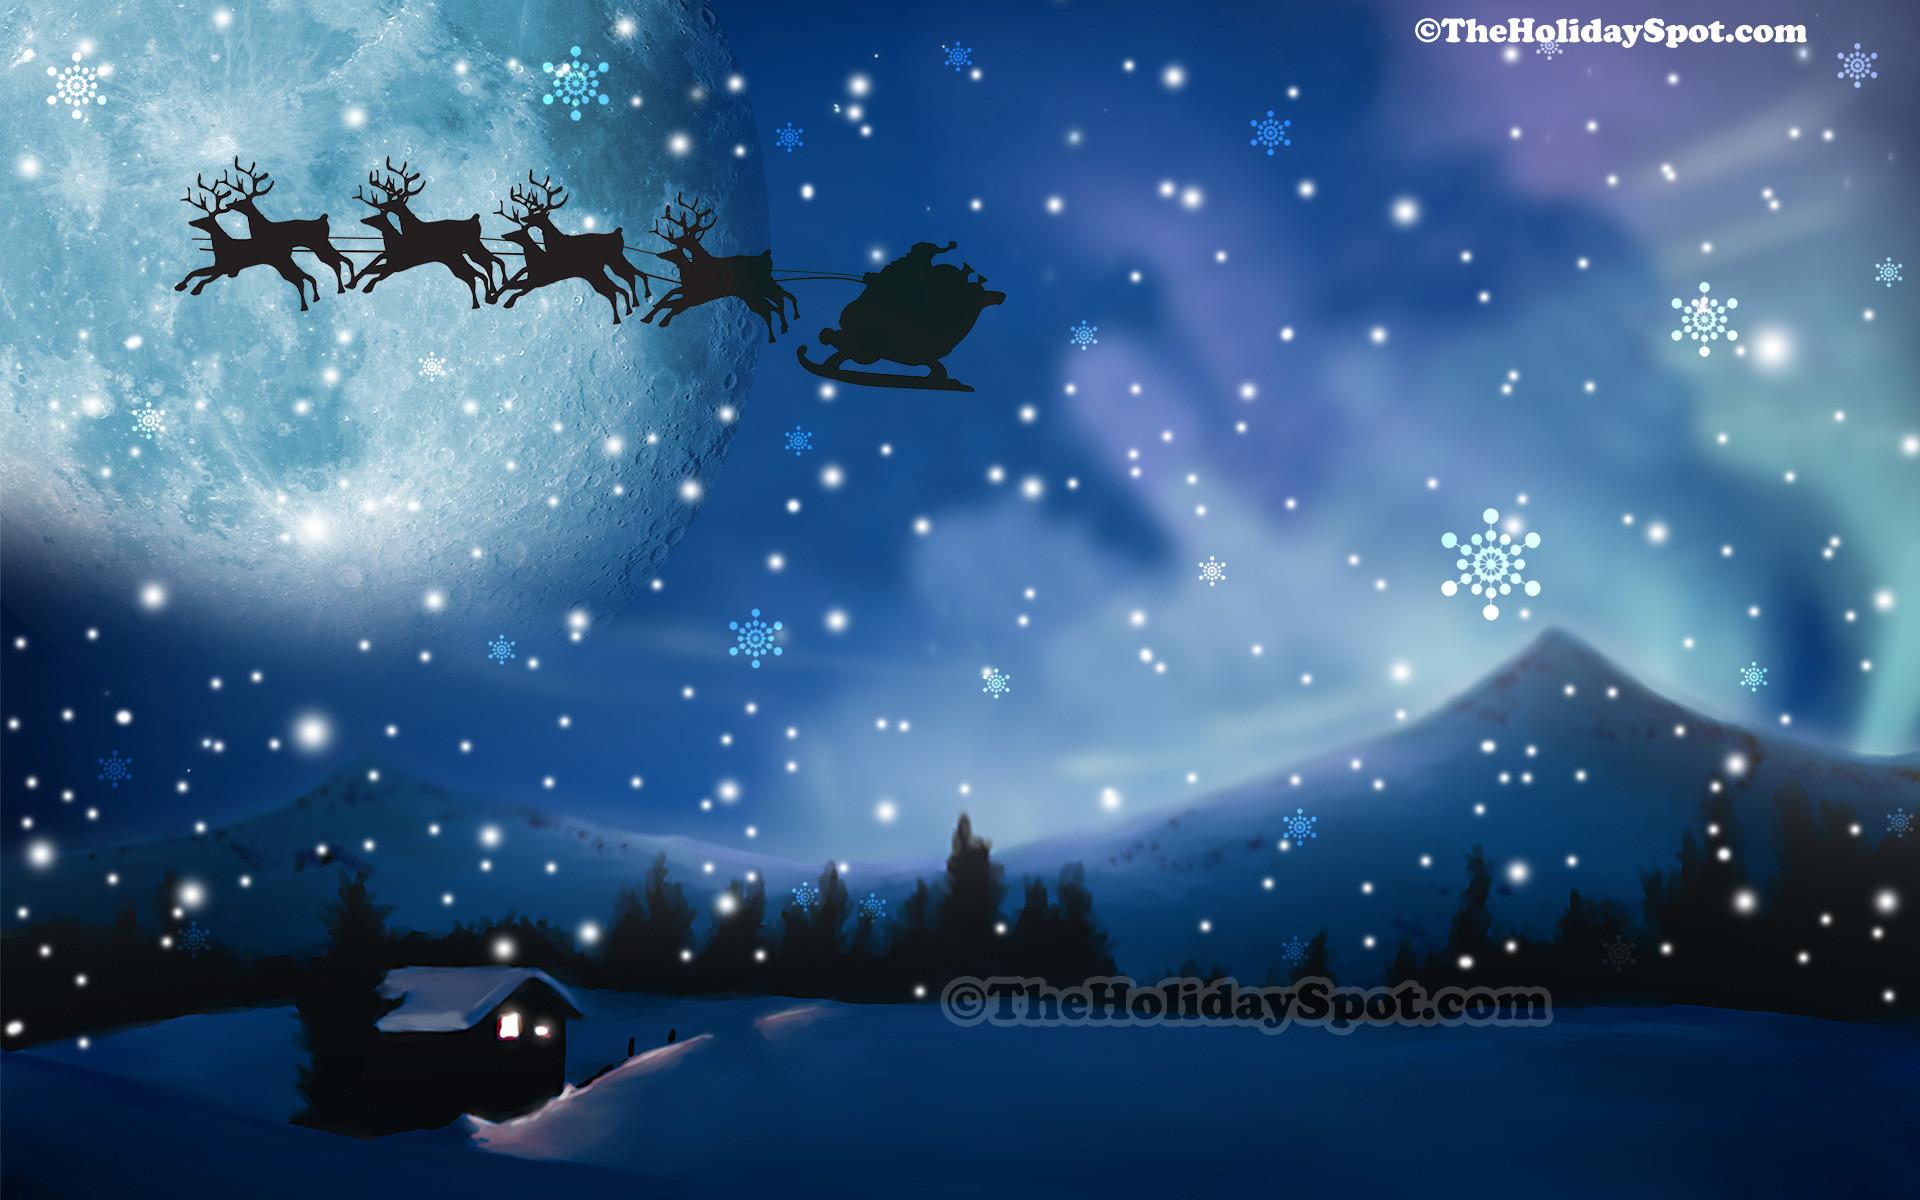 HD Christmas Wallpaper